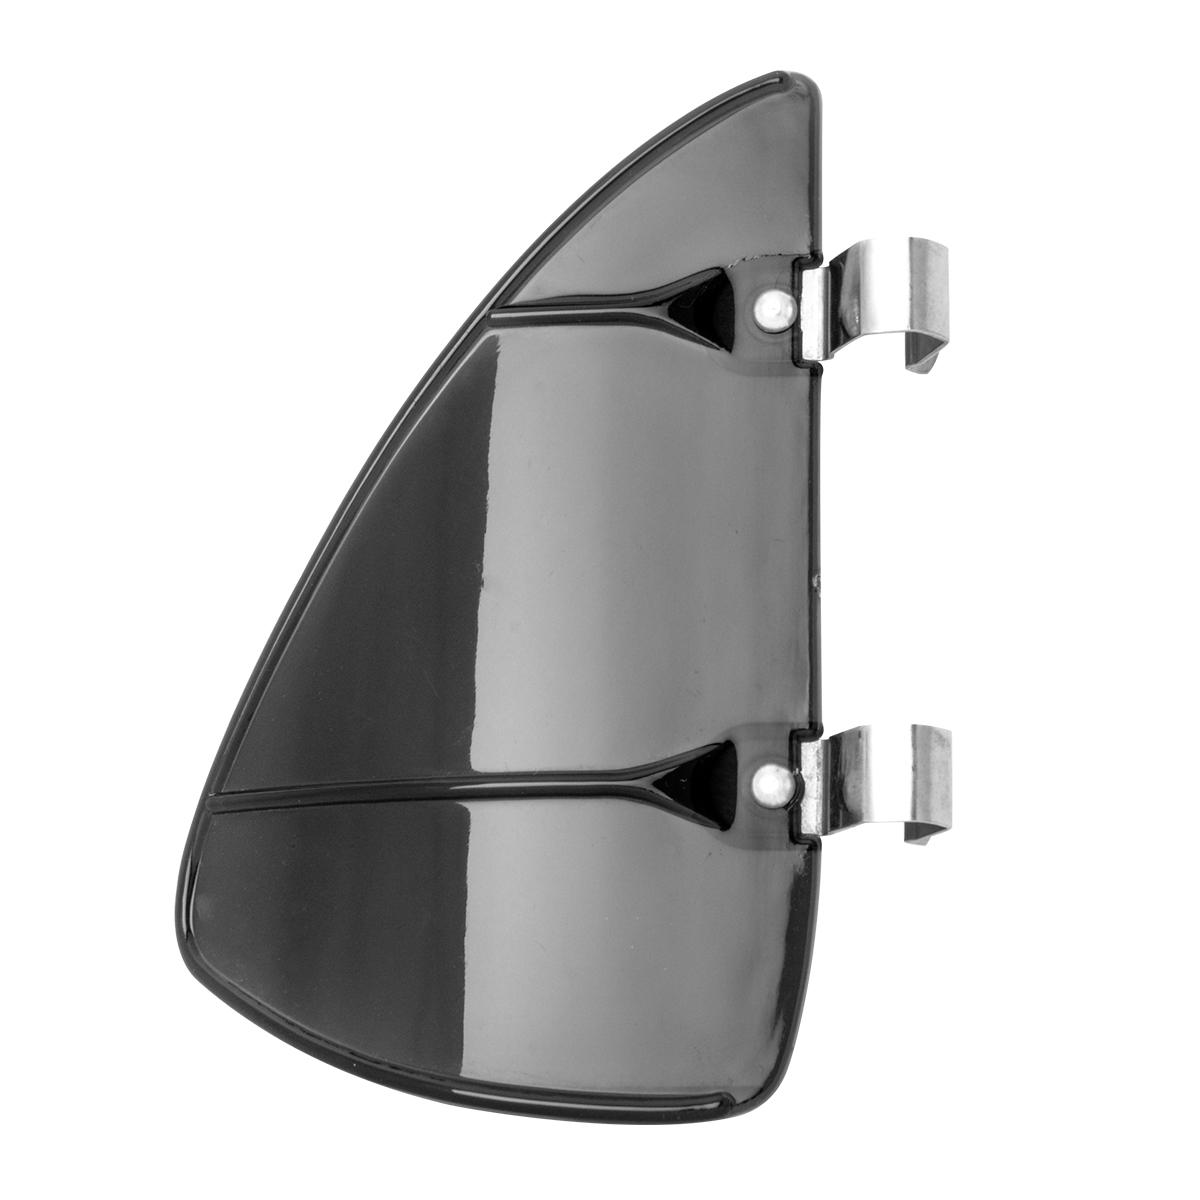 #50155 Acrylic Vent Wind Window Breeze w/ Stainless Steel Clips - Smoked Gray